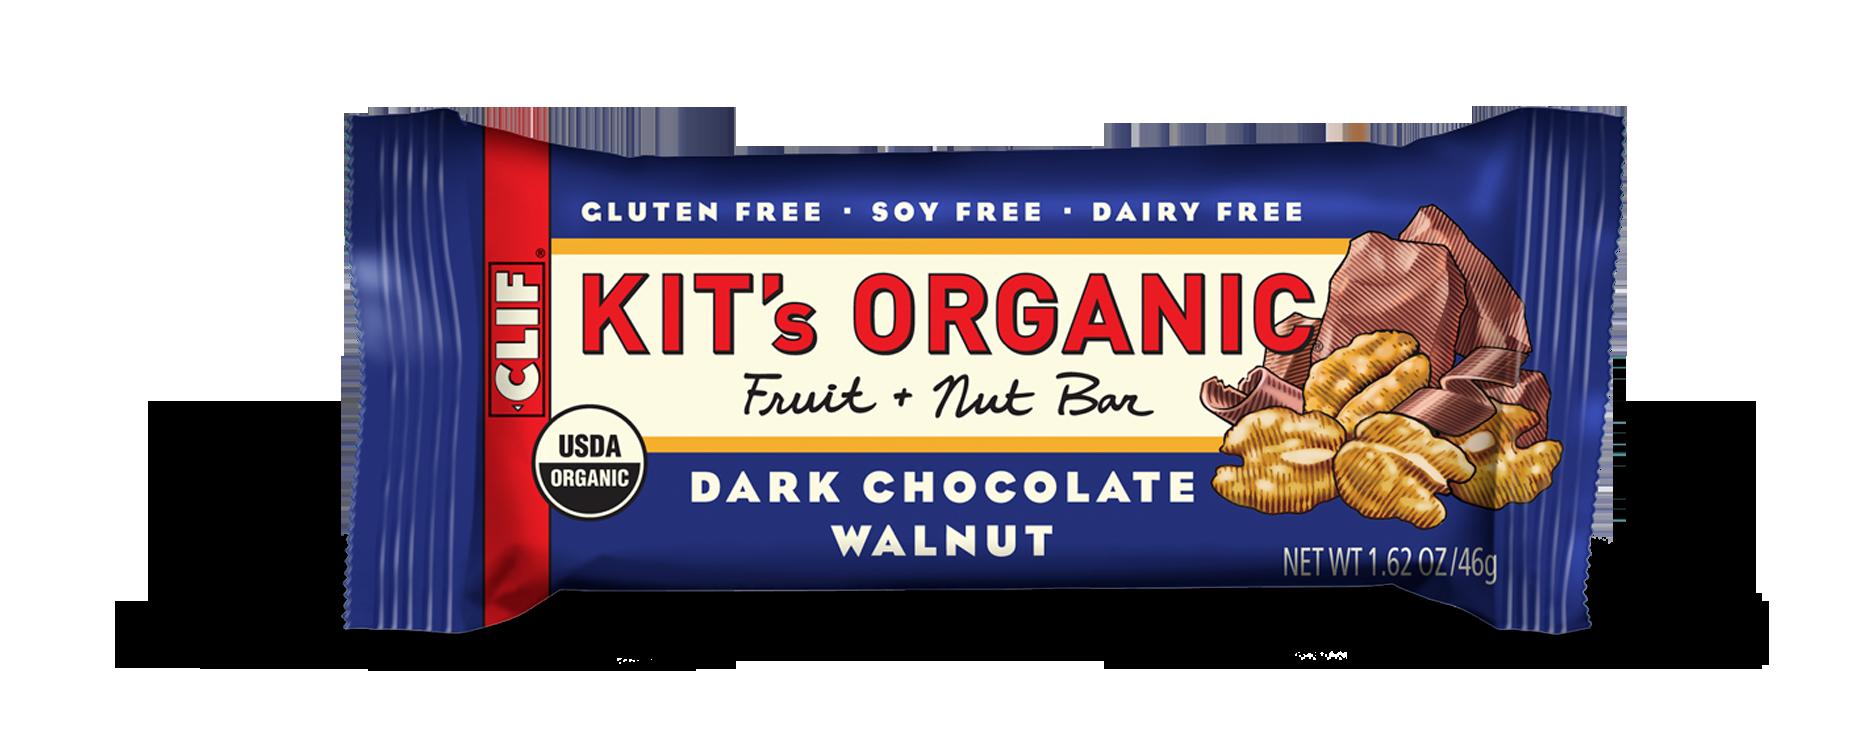 Clif Kit's Organic Dark Chocolate Walnut Bar